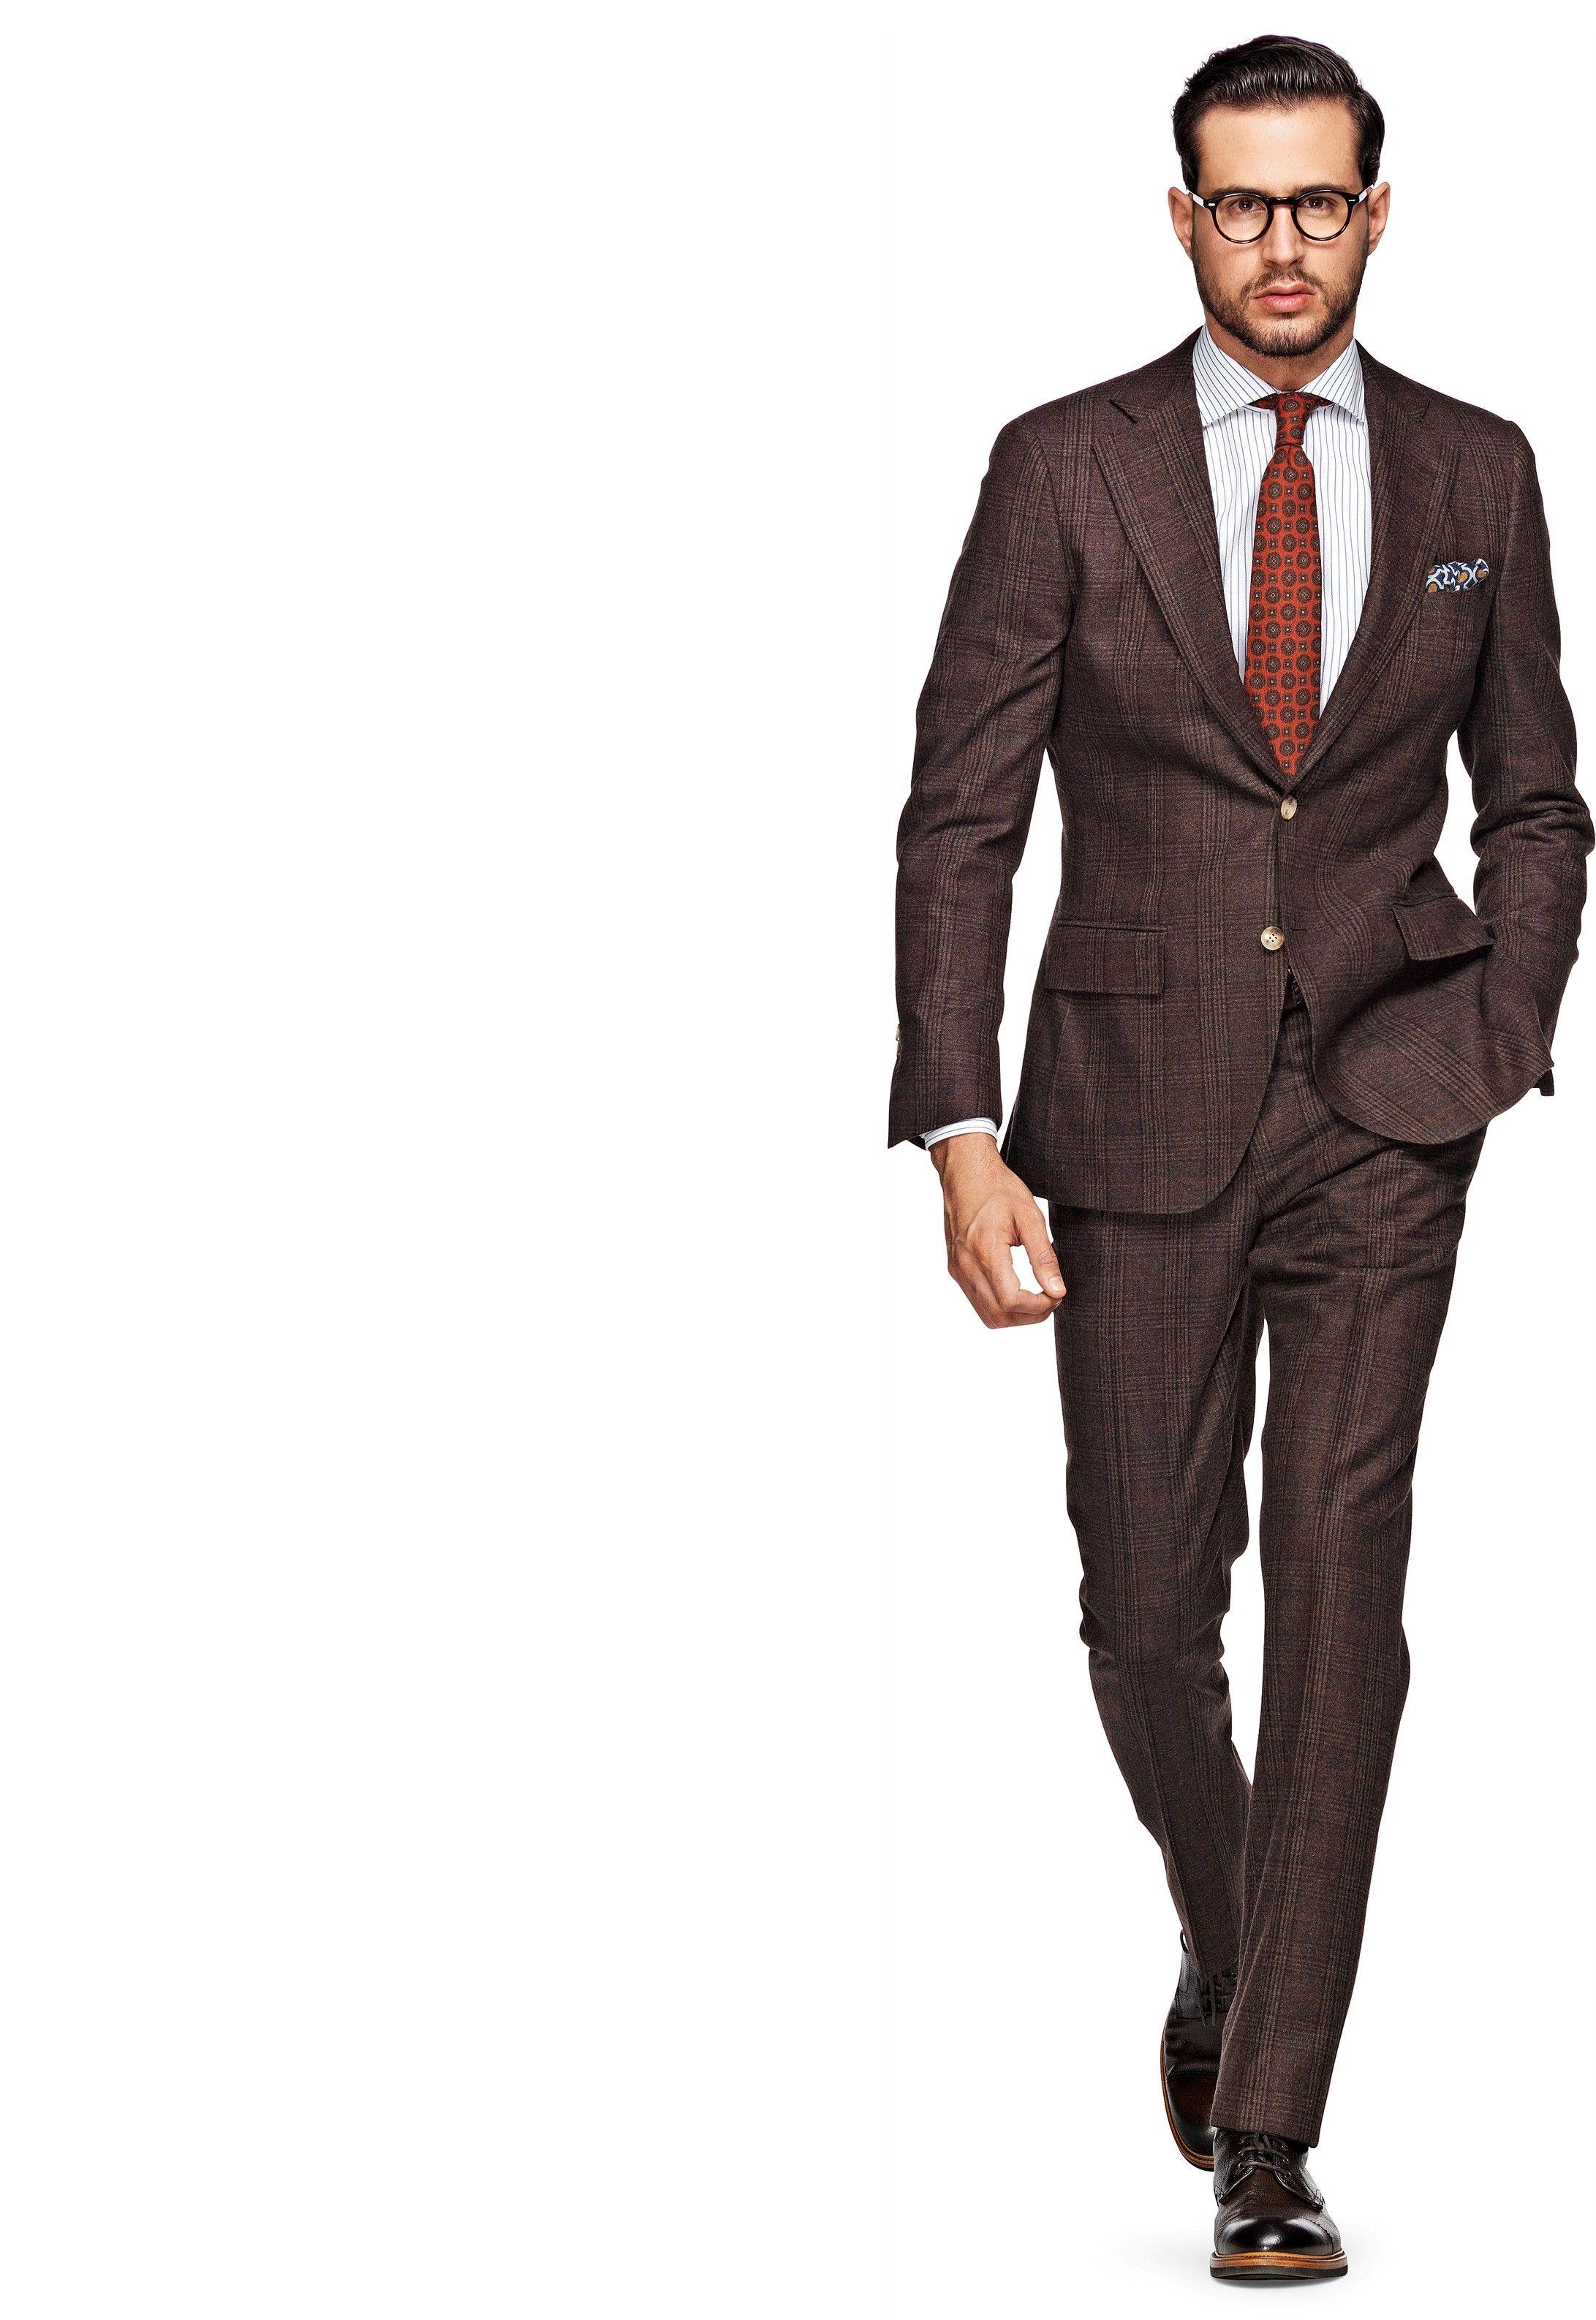 Suitsupply Suits   Tailoring  0416bfc8921de